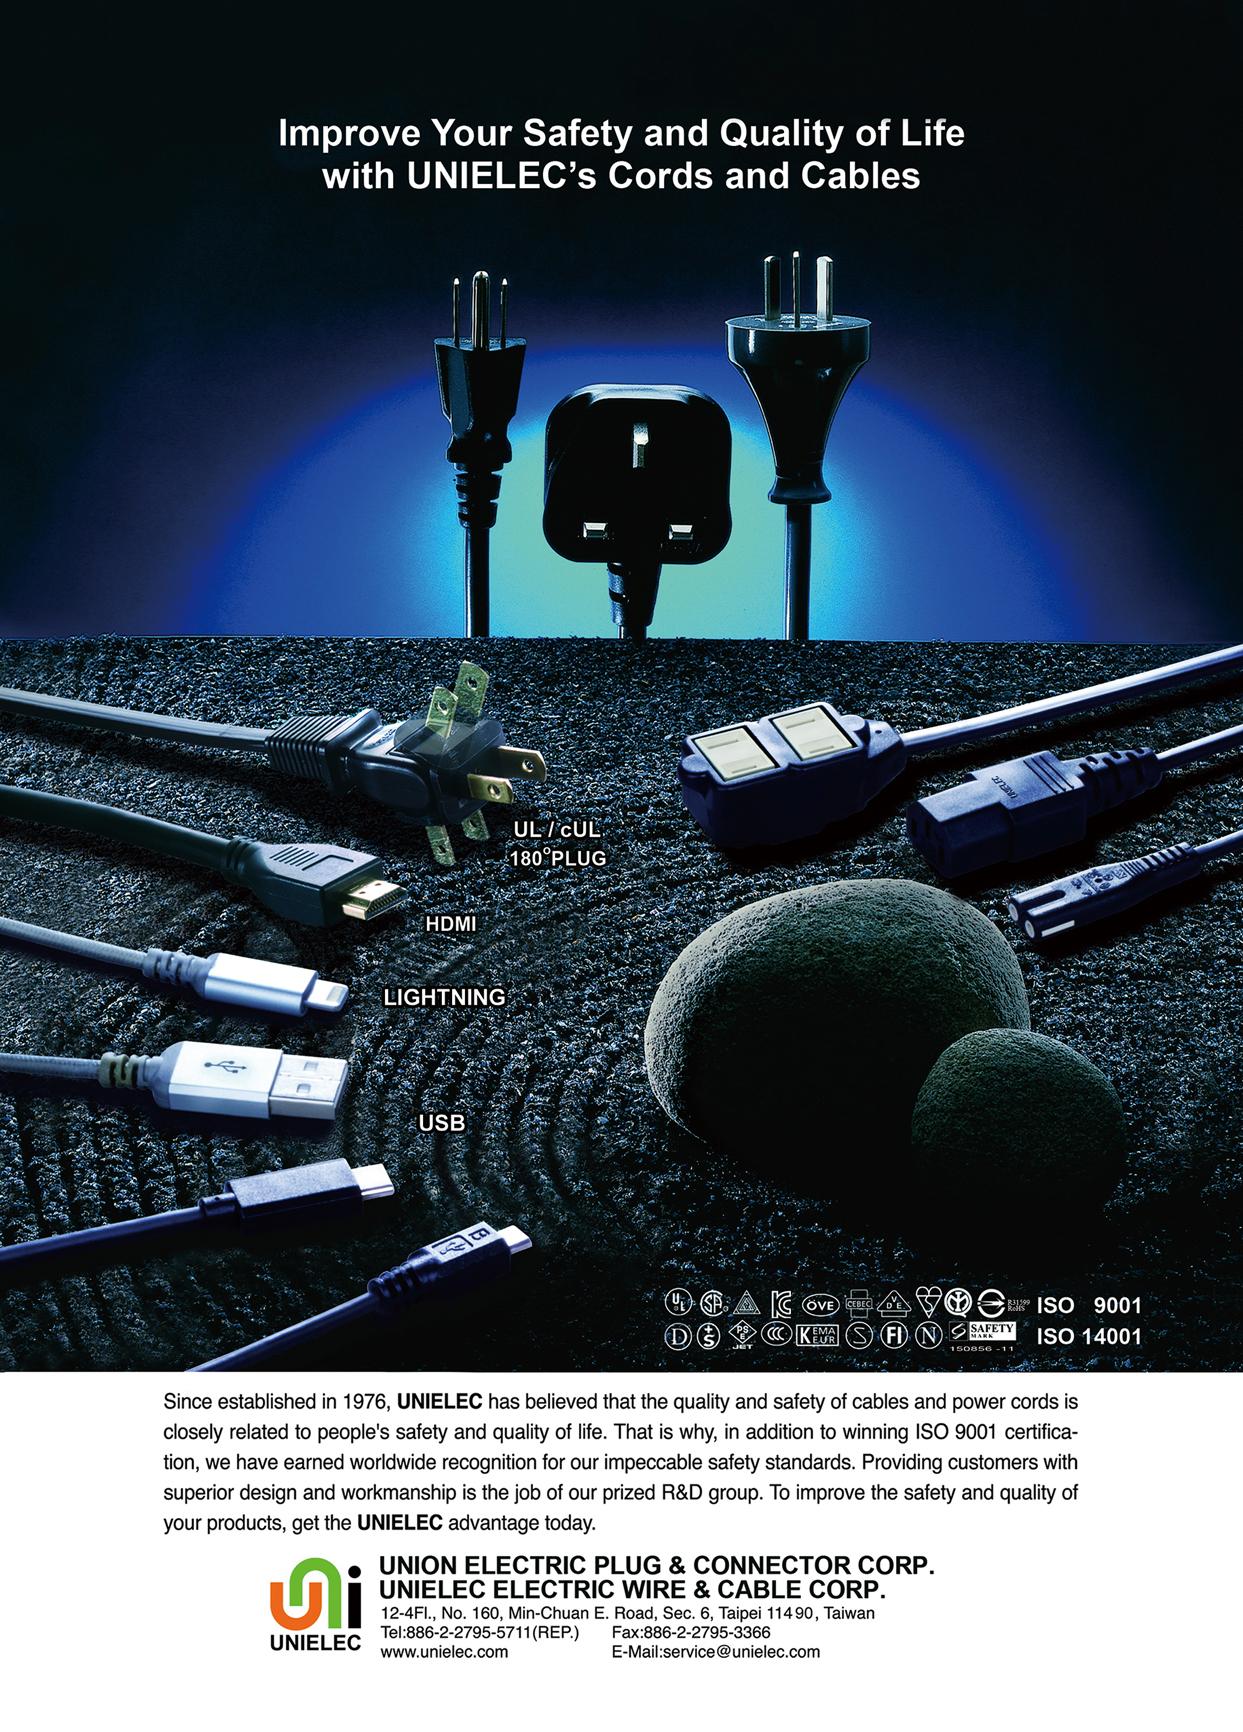 Taipei Int'l Electronics Show UNION ELECTRIC PLUG & CONNECTOR CORP.